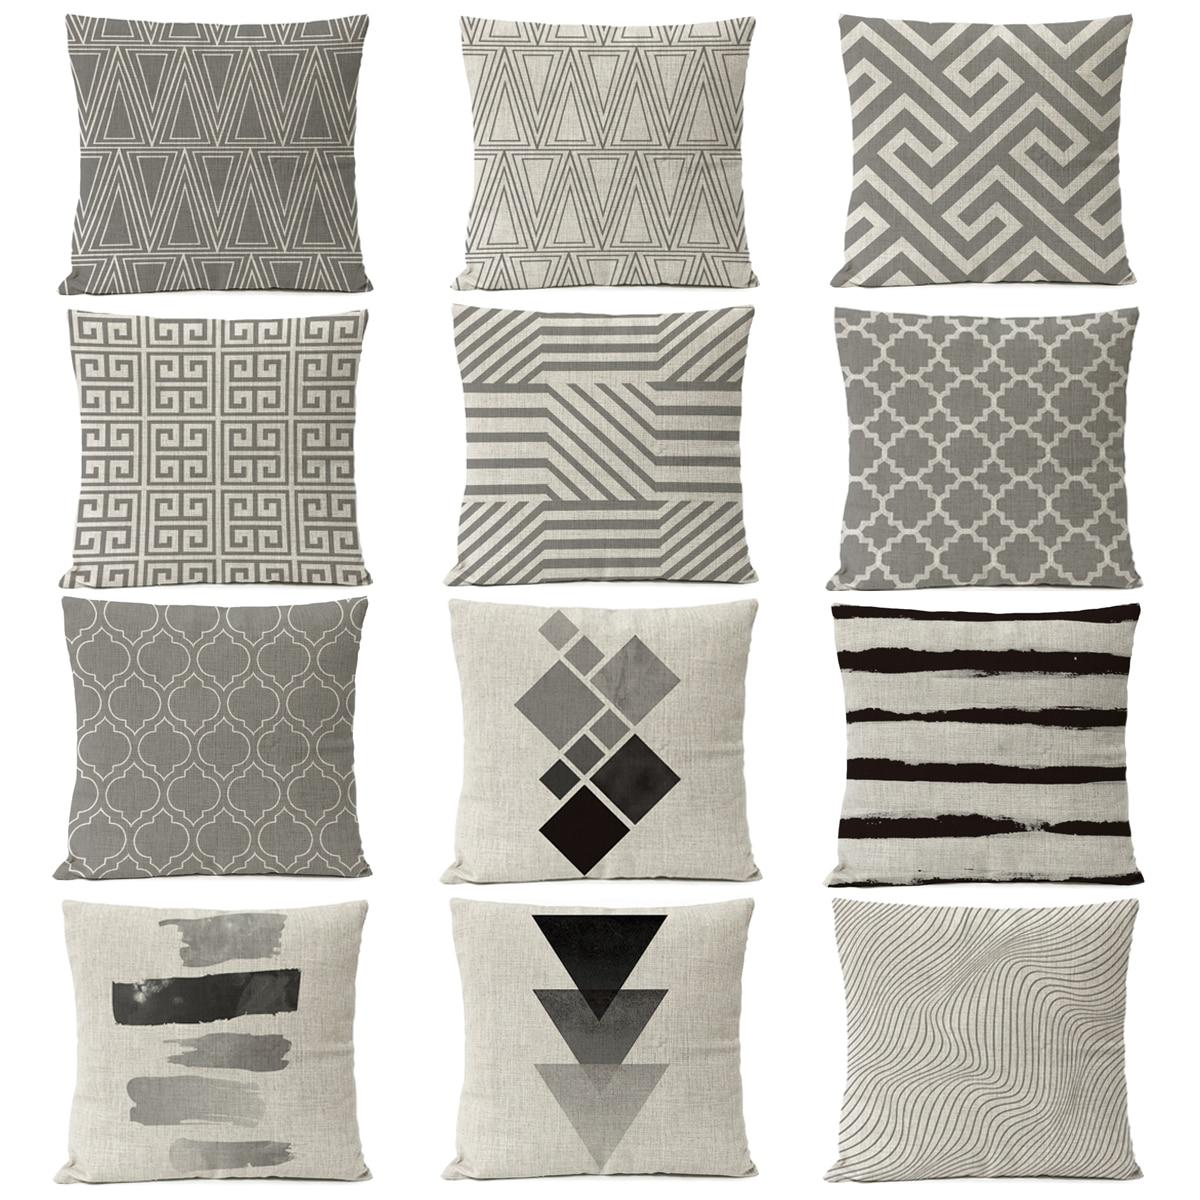 2019 nordic black gray geometric pillow cover geometry linen grey pillow case home decorative pillows stripe cushion cover